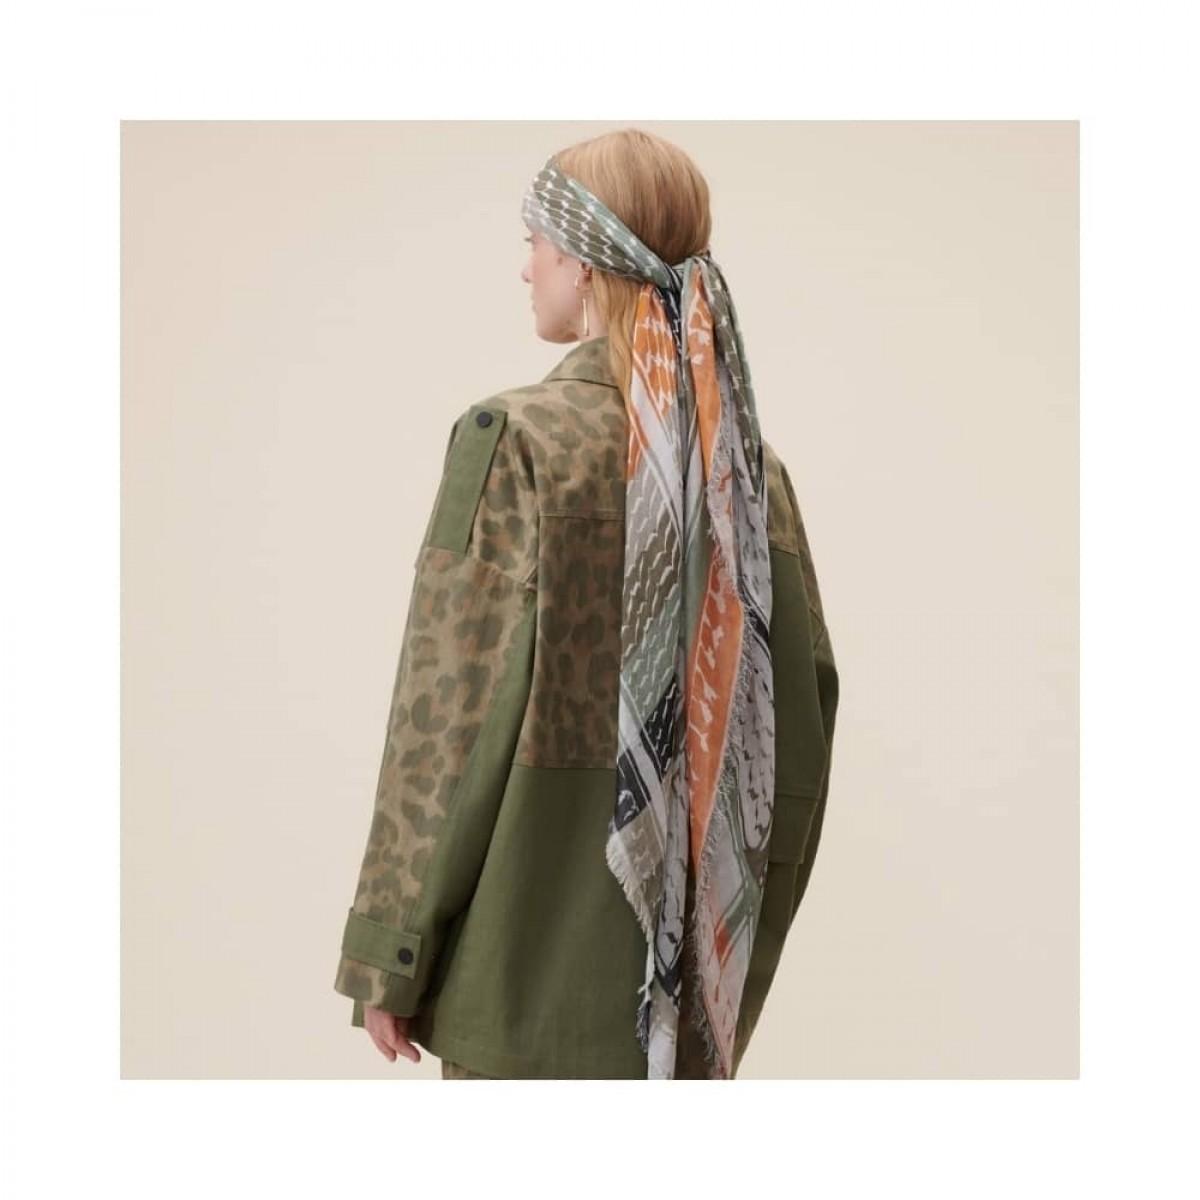 cotton triangle kufiya stripes tørklæde - olive - model fra siden